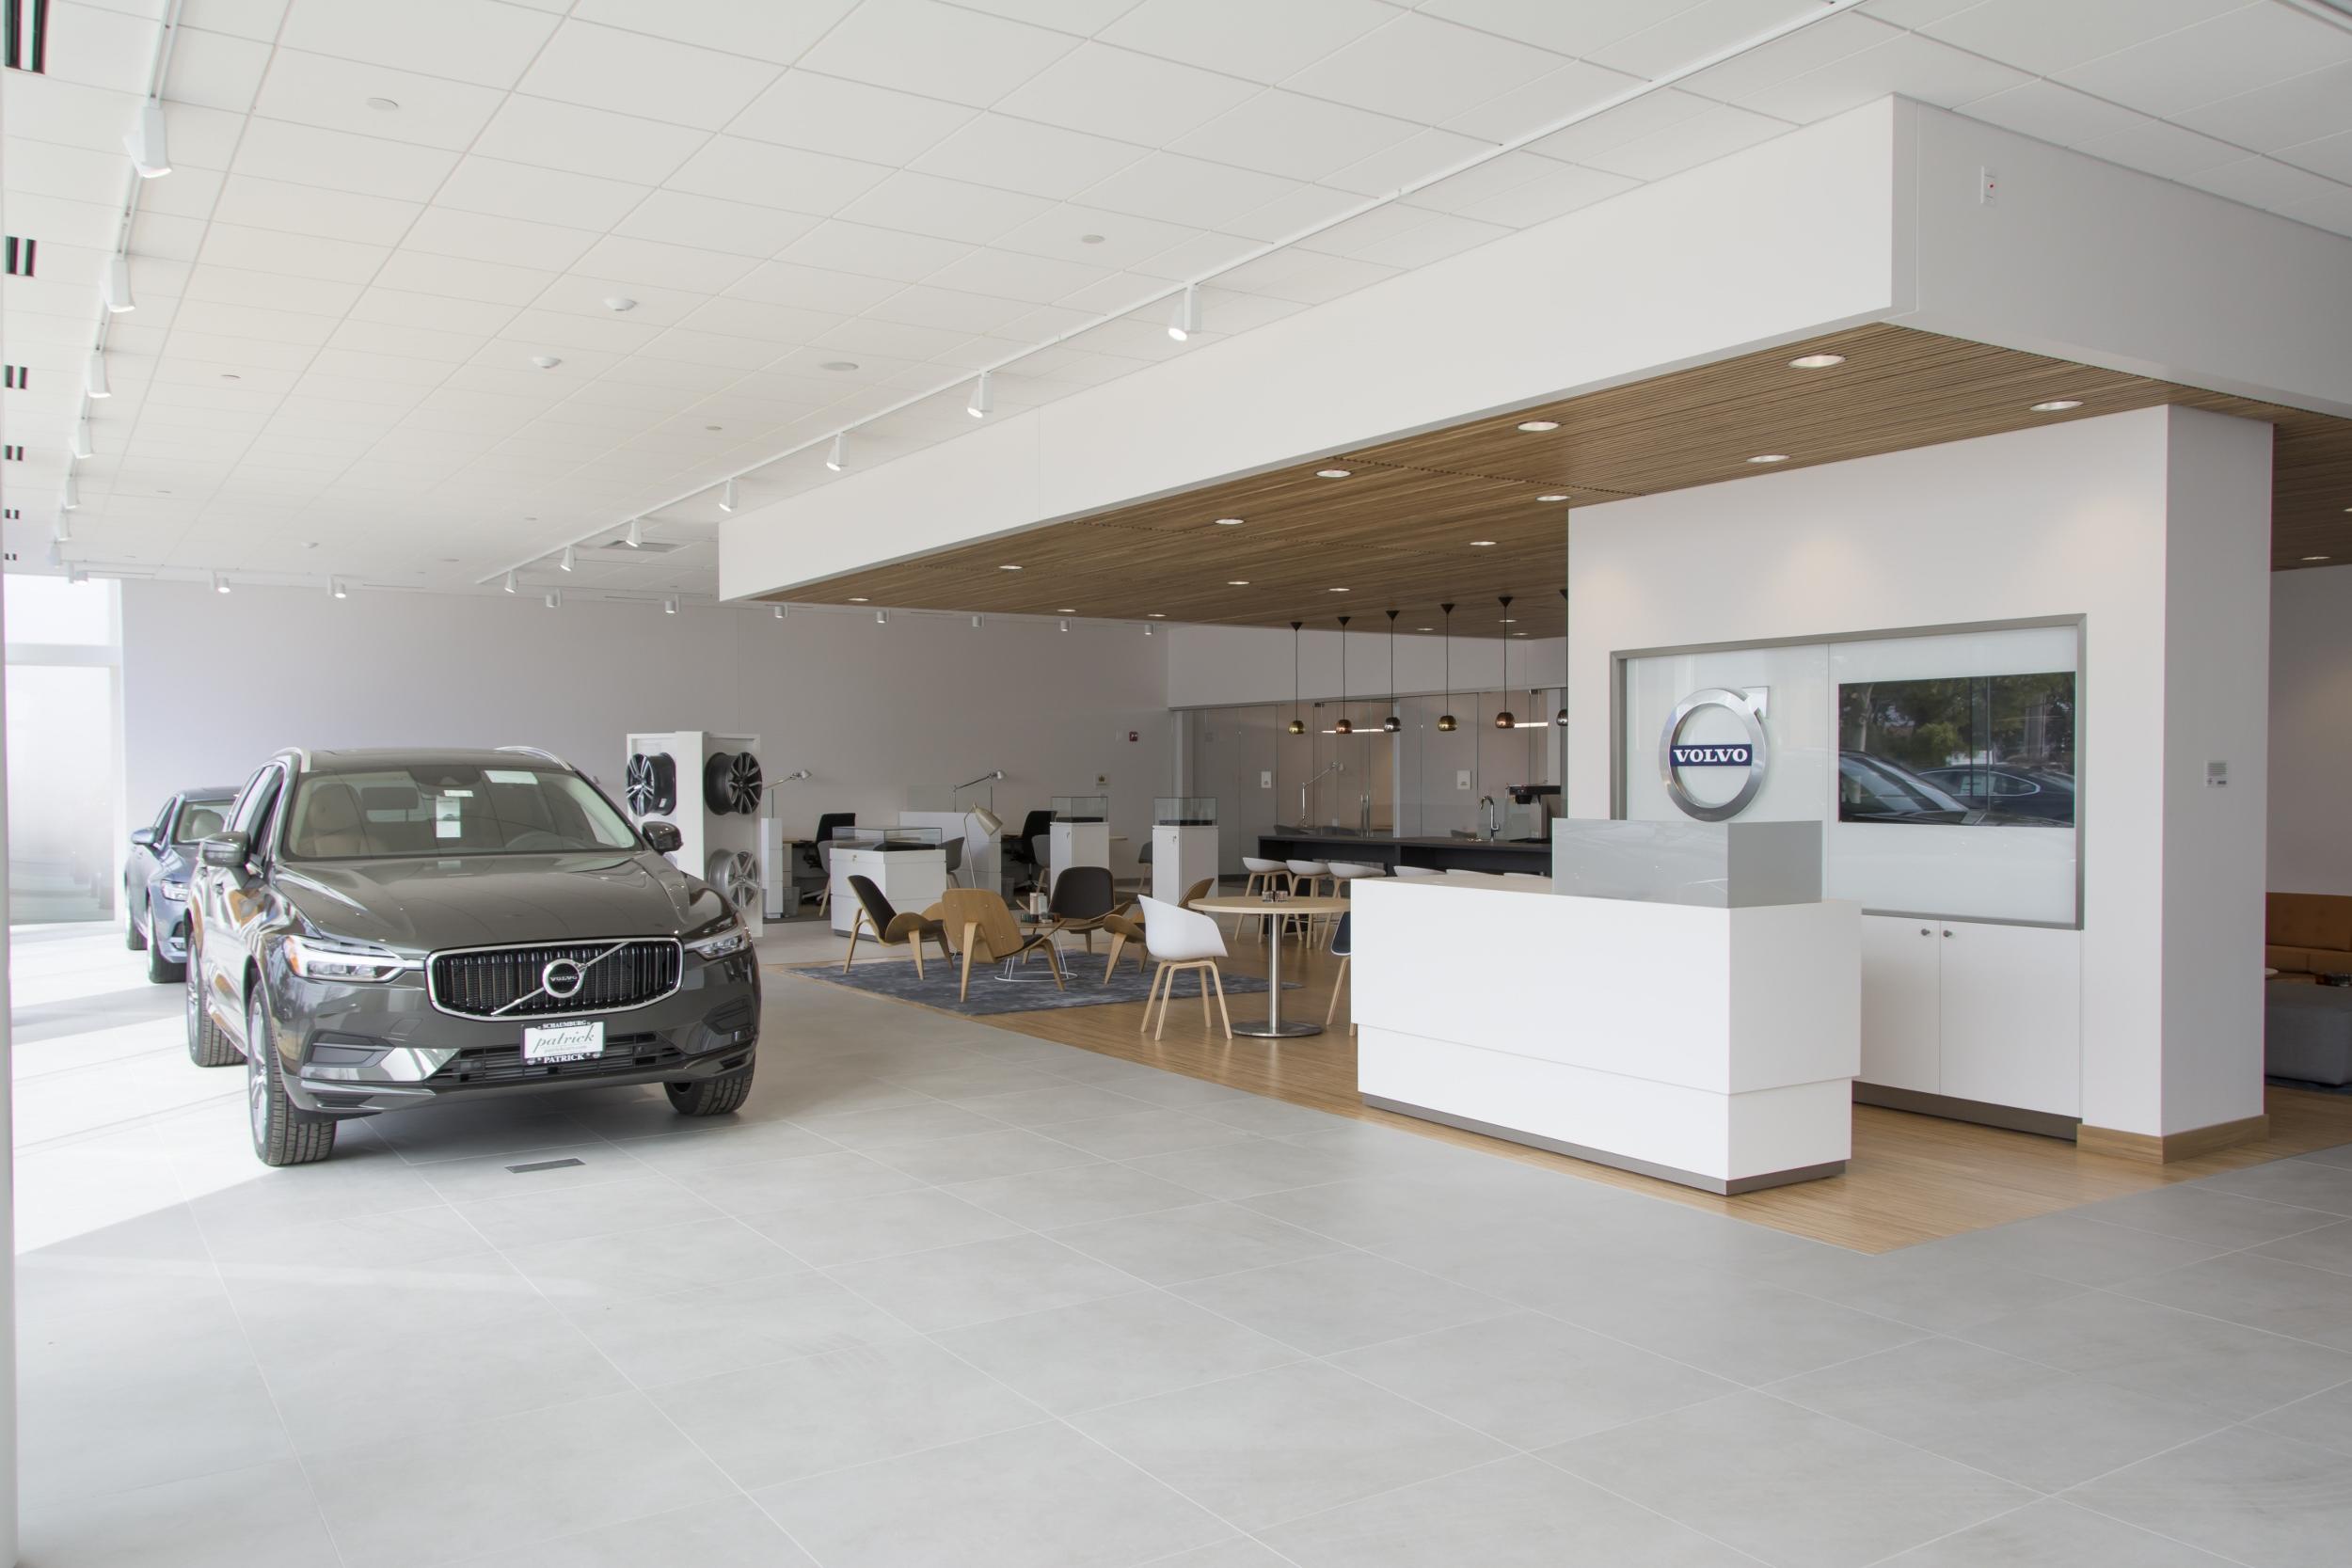 Interior of Patrick Volvo.